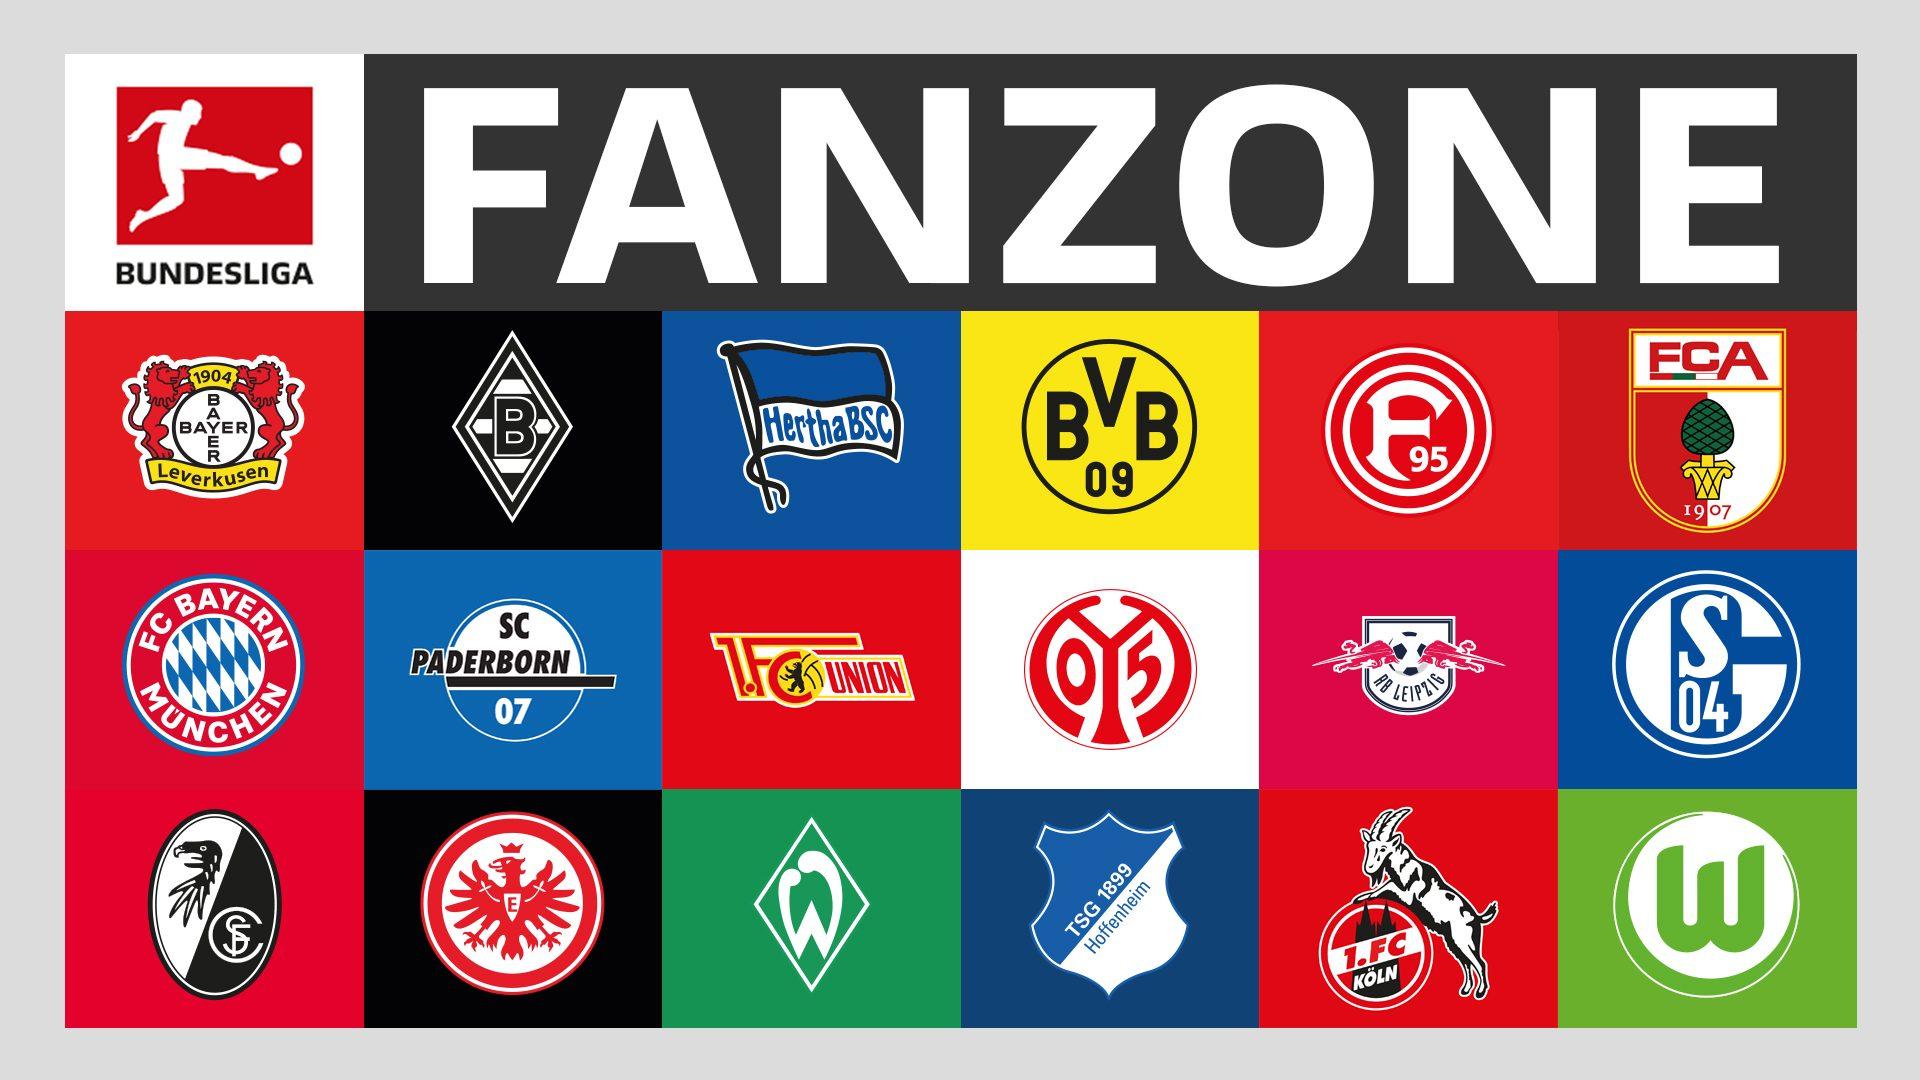 Bundesliga Bundesliga Fanzone 2019 20